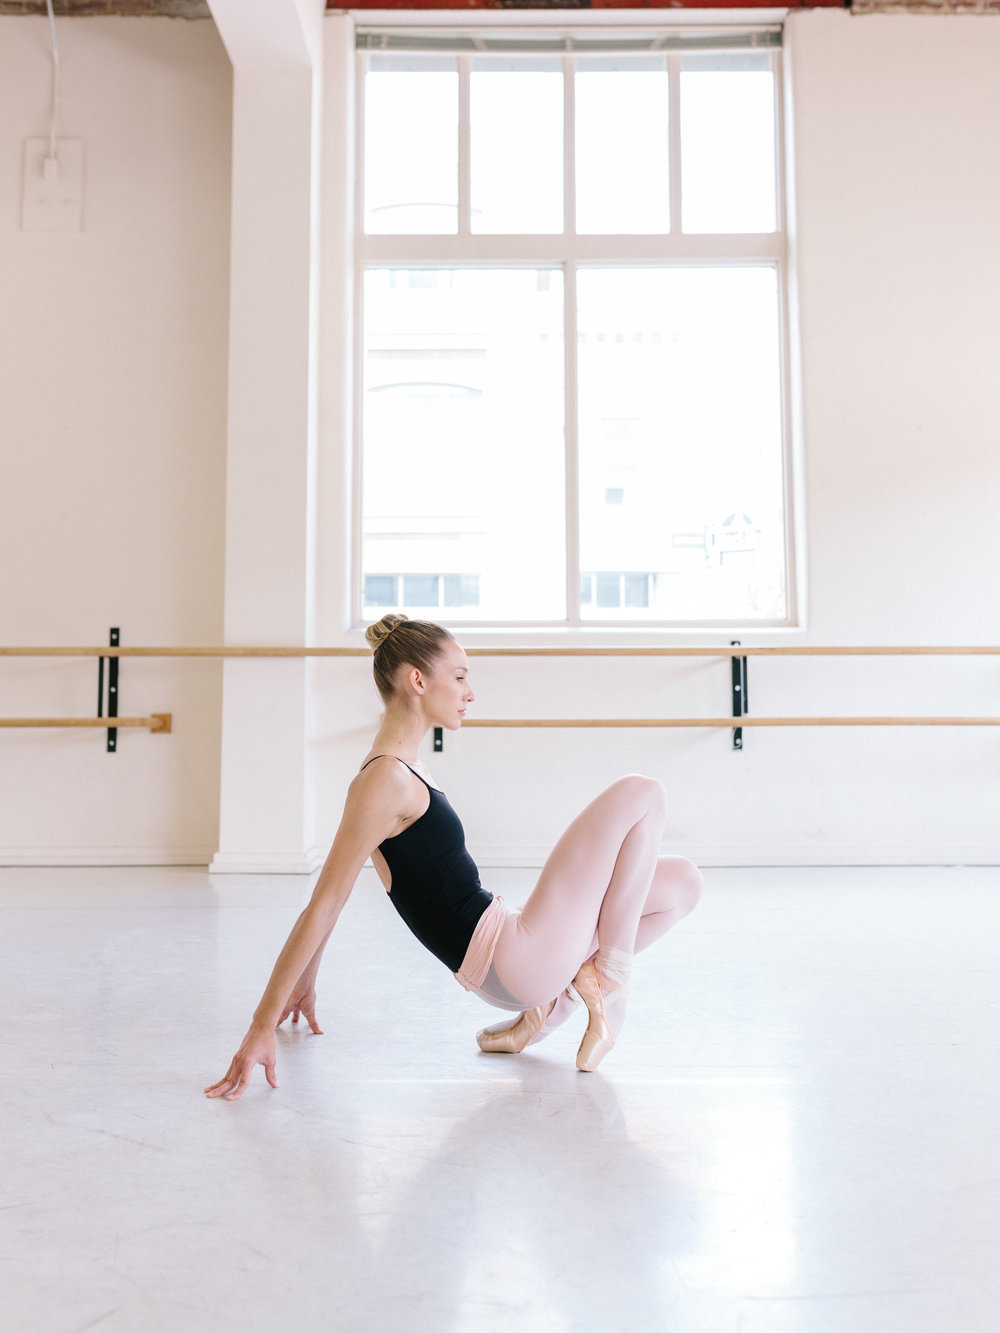 Jessica_Ballet-13.JPG